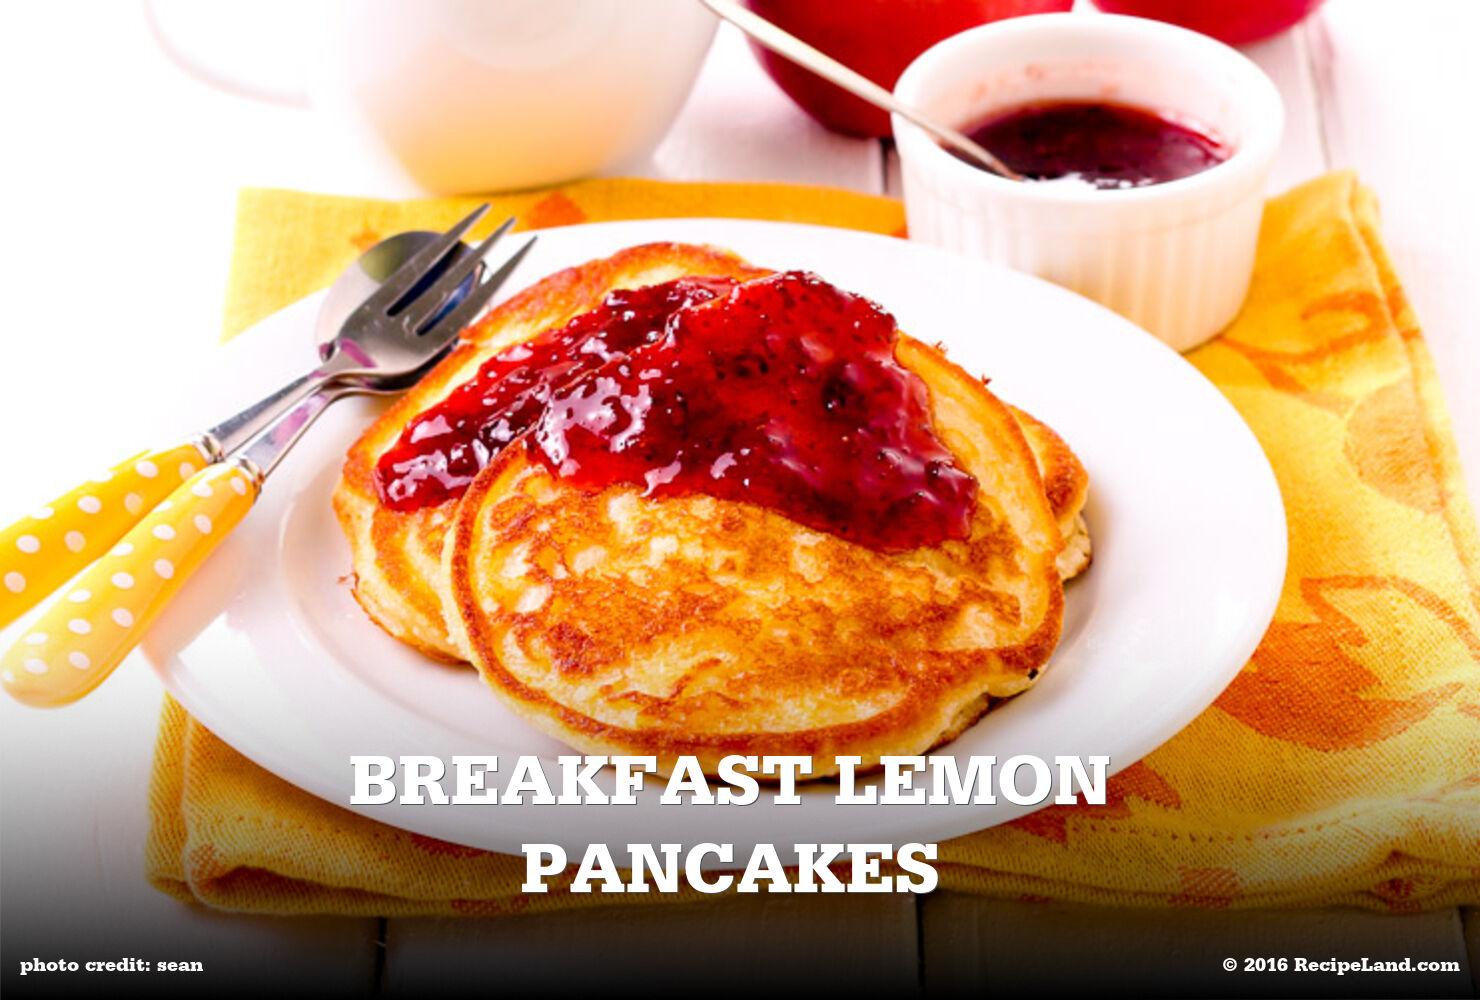 Breakfast Lemon Pancakes